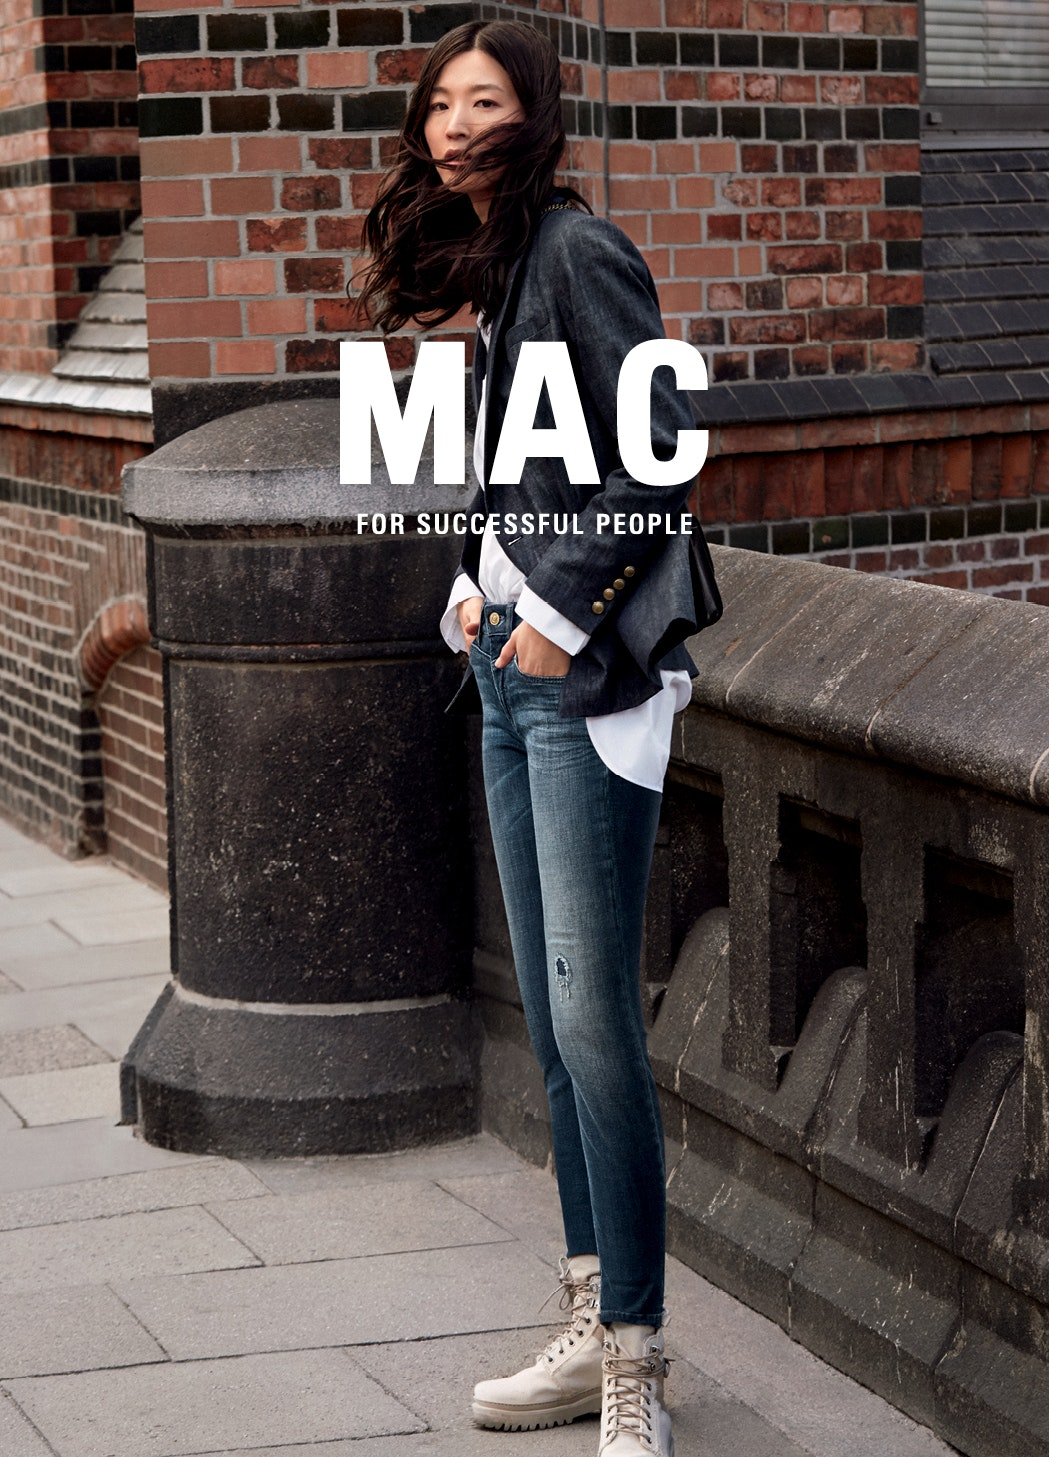 MAC_fall_winter_2020_large_MAC_Kampagne-